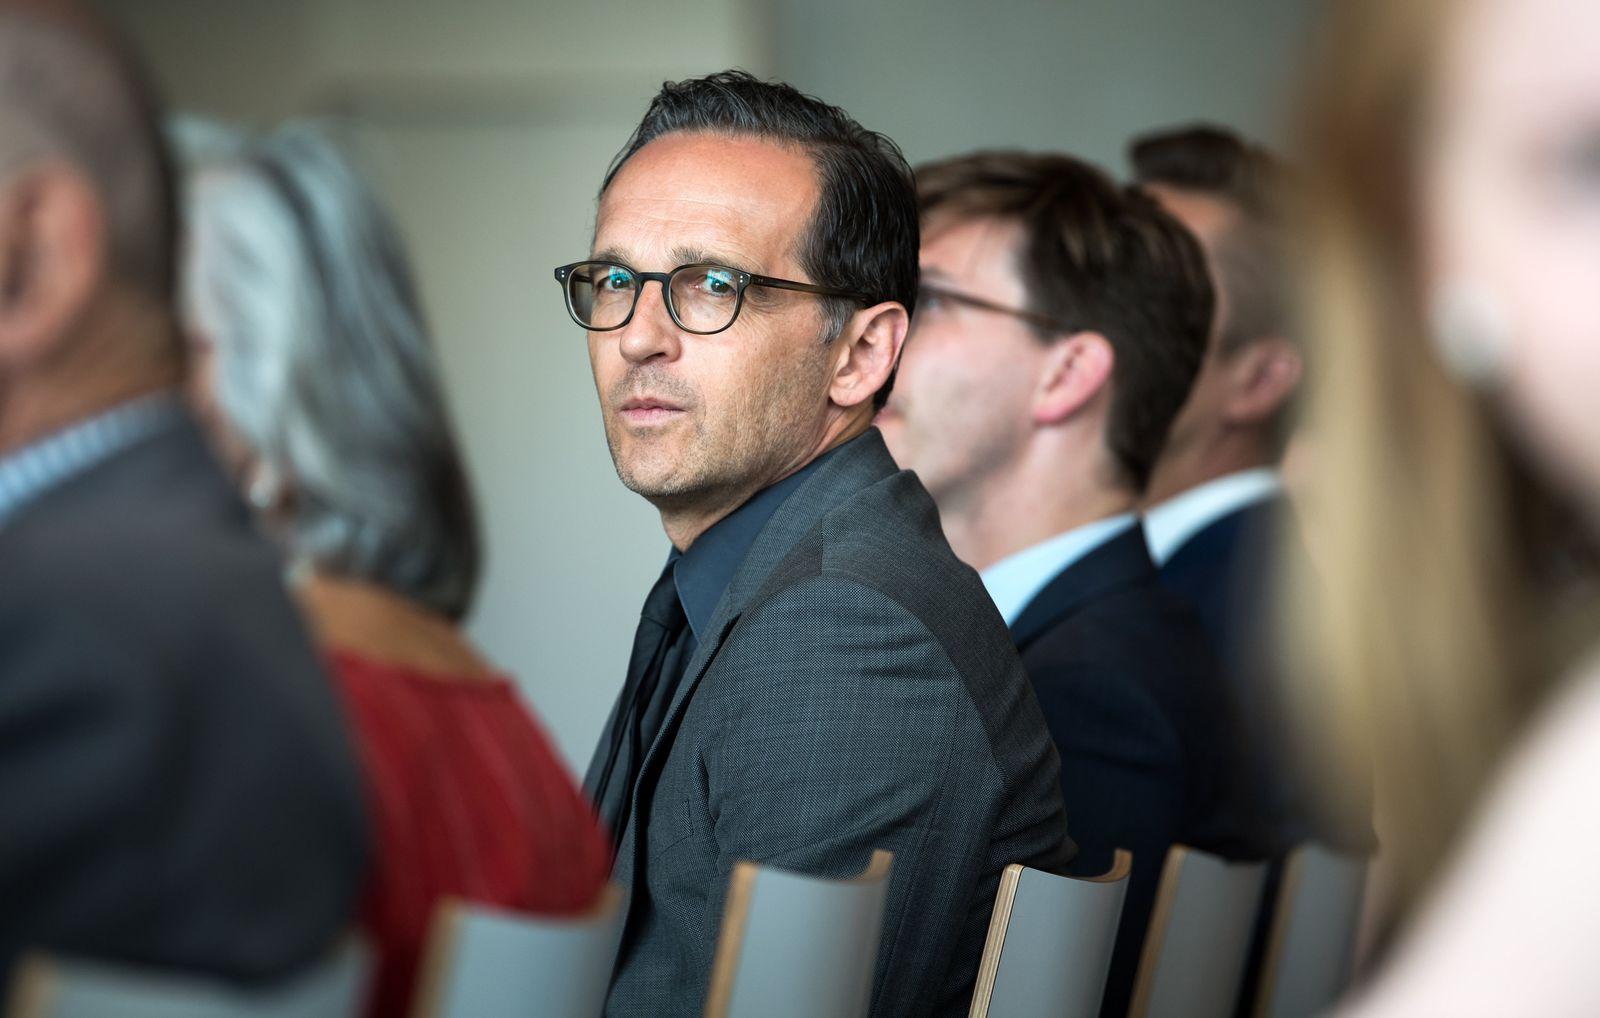 Ehrung der Anne-Frank-Botschafter 2017